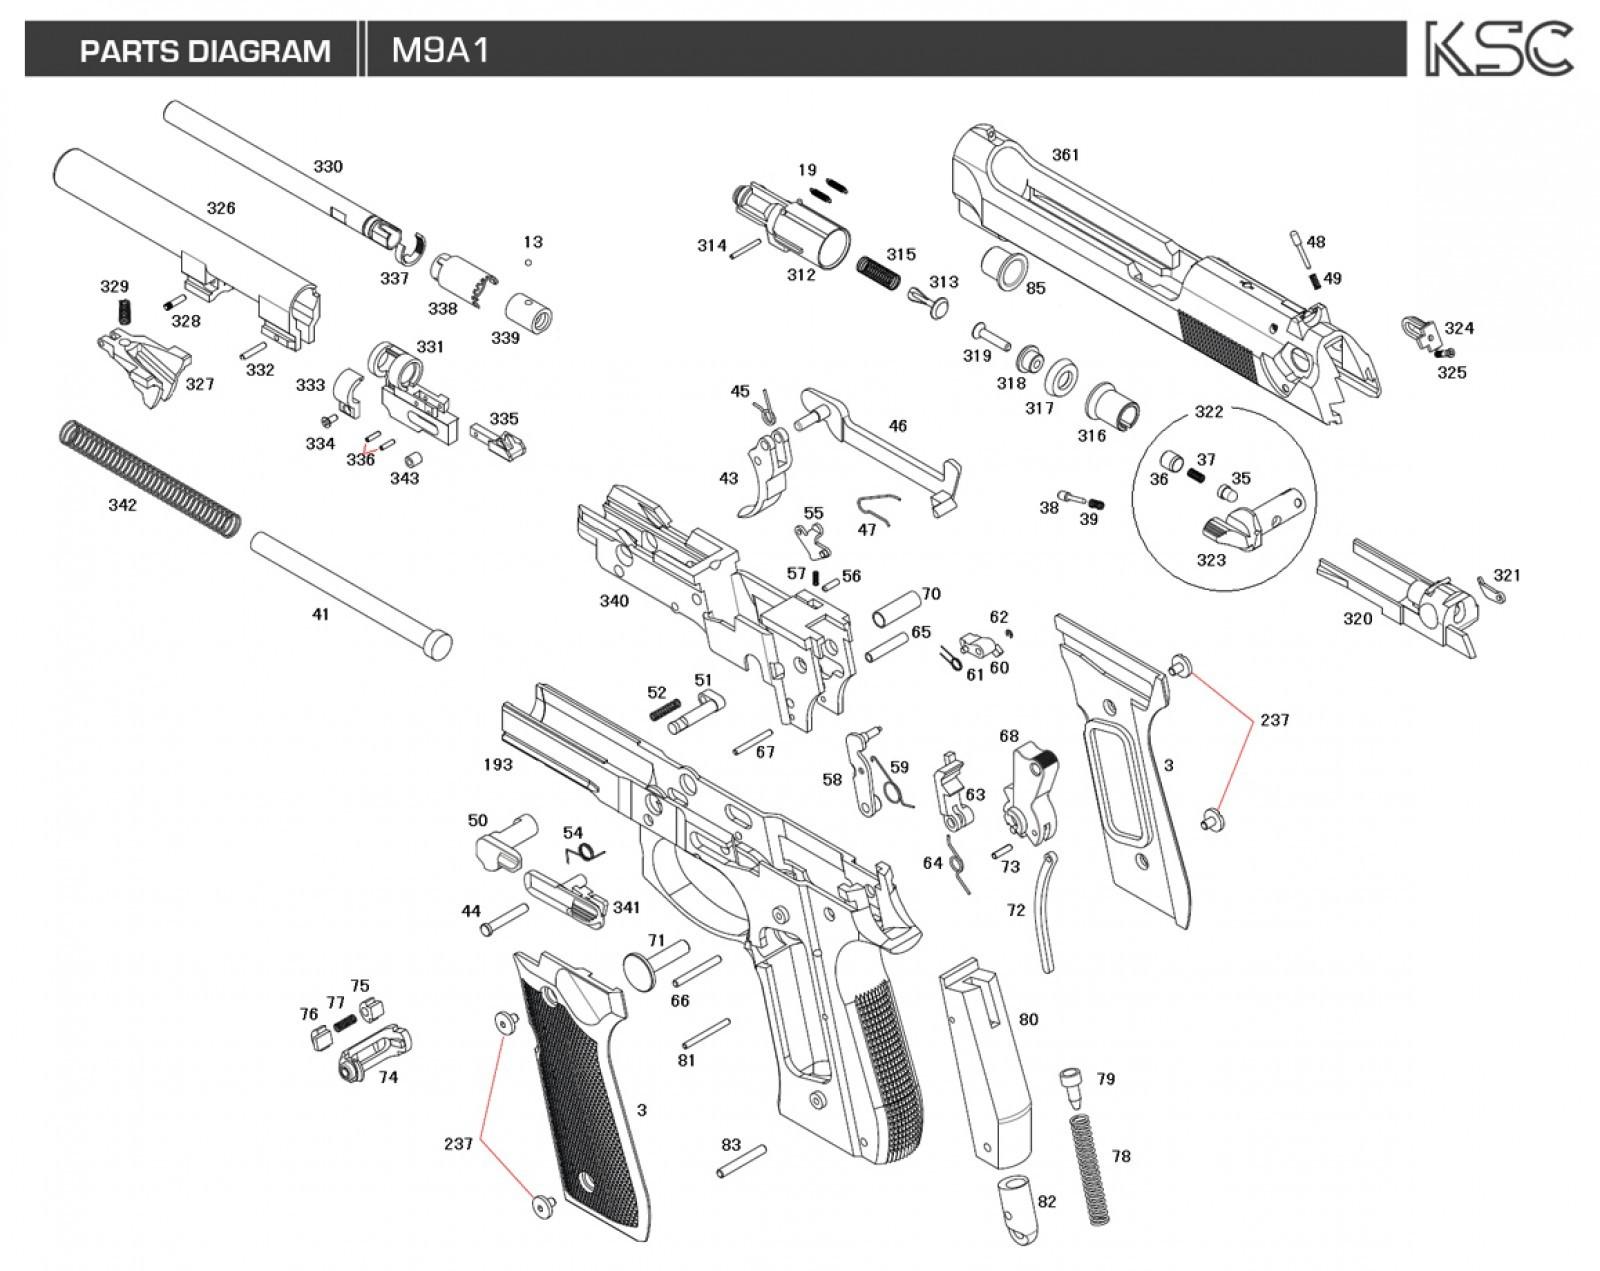 Ksc M9 Gbb Cylinder Part No 312 Ksc M92 312